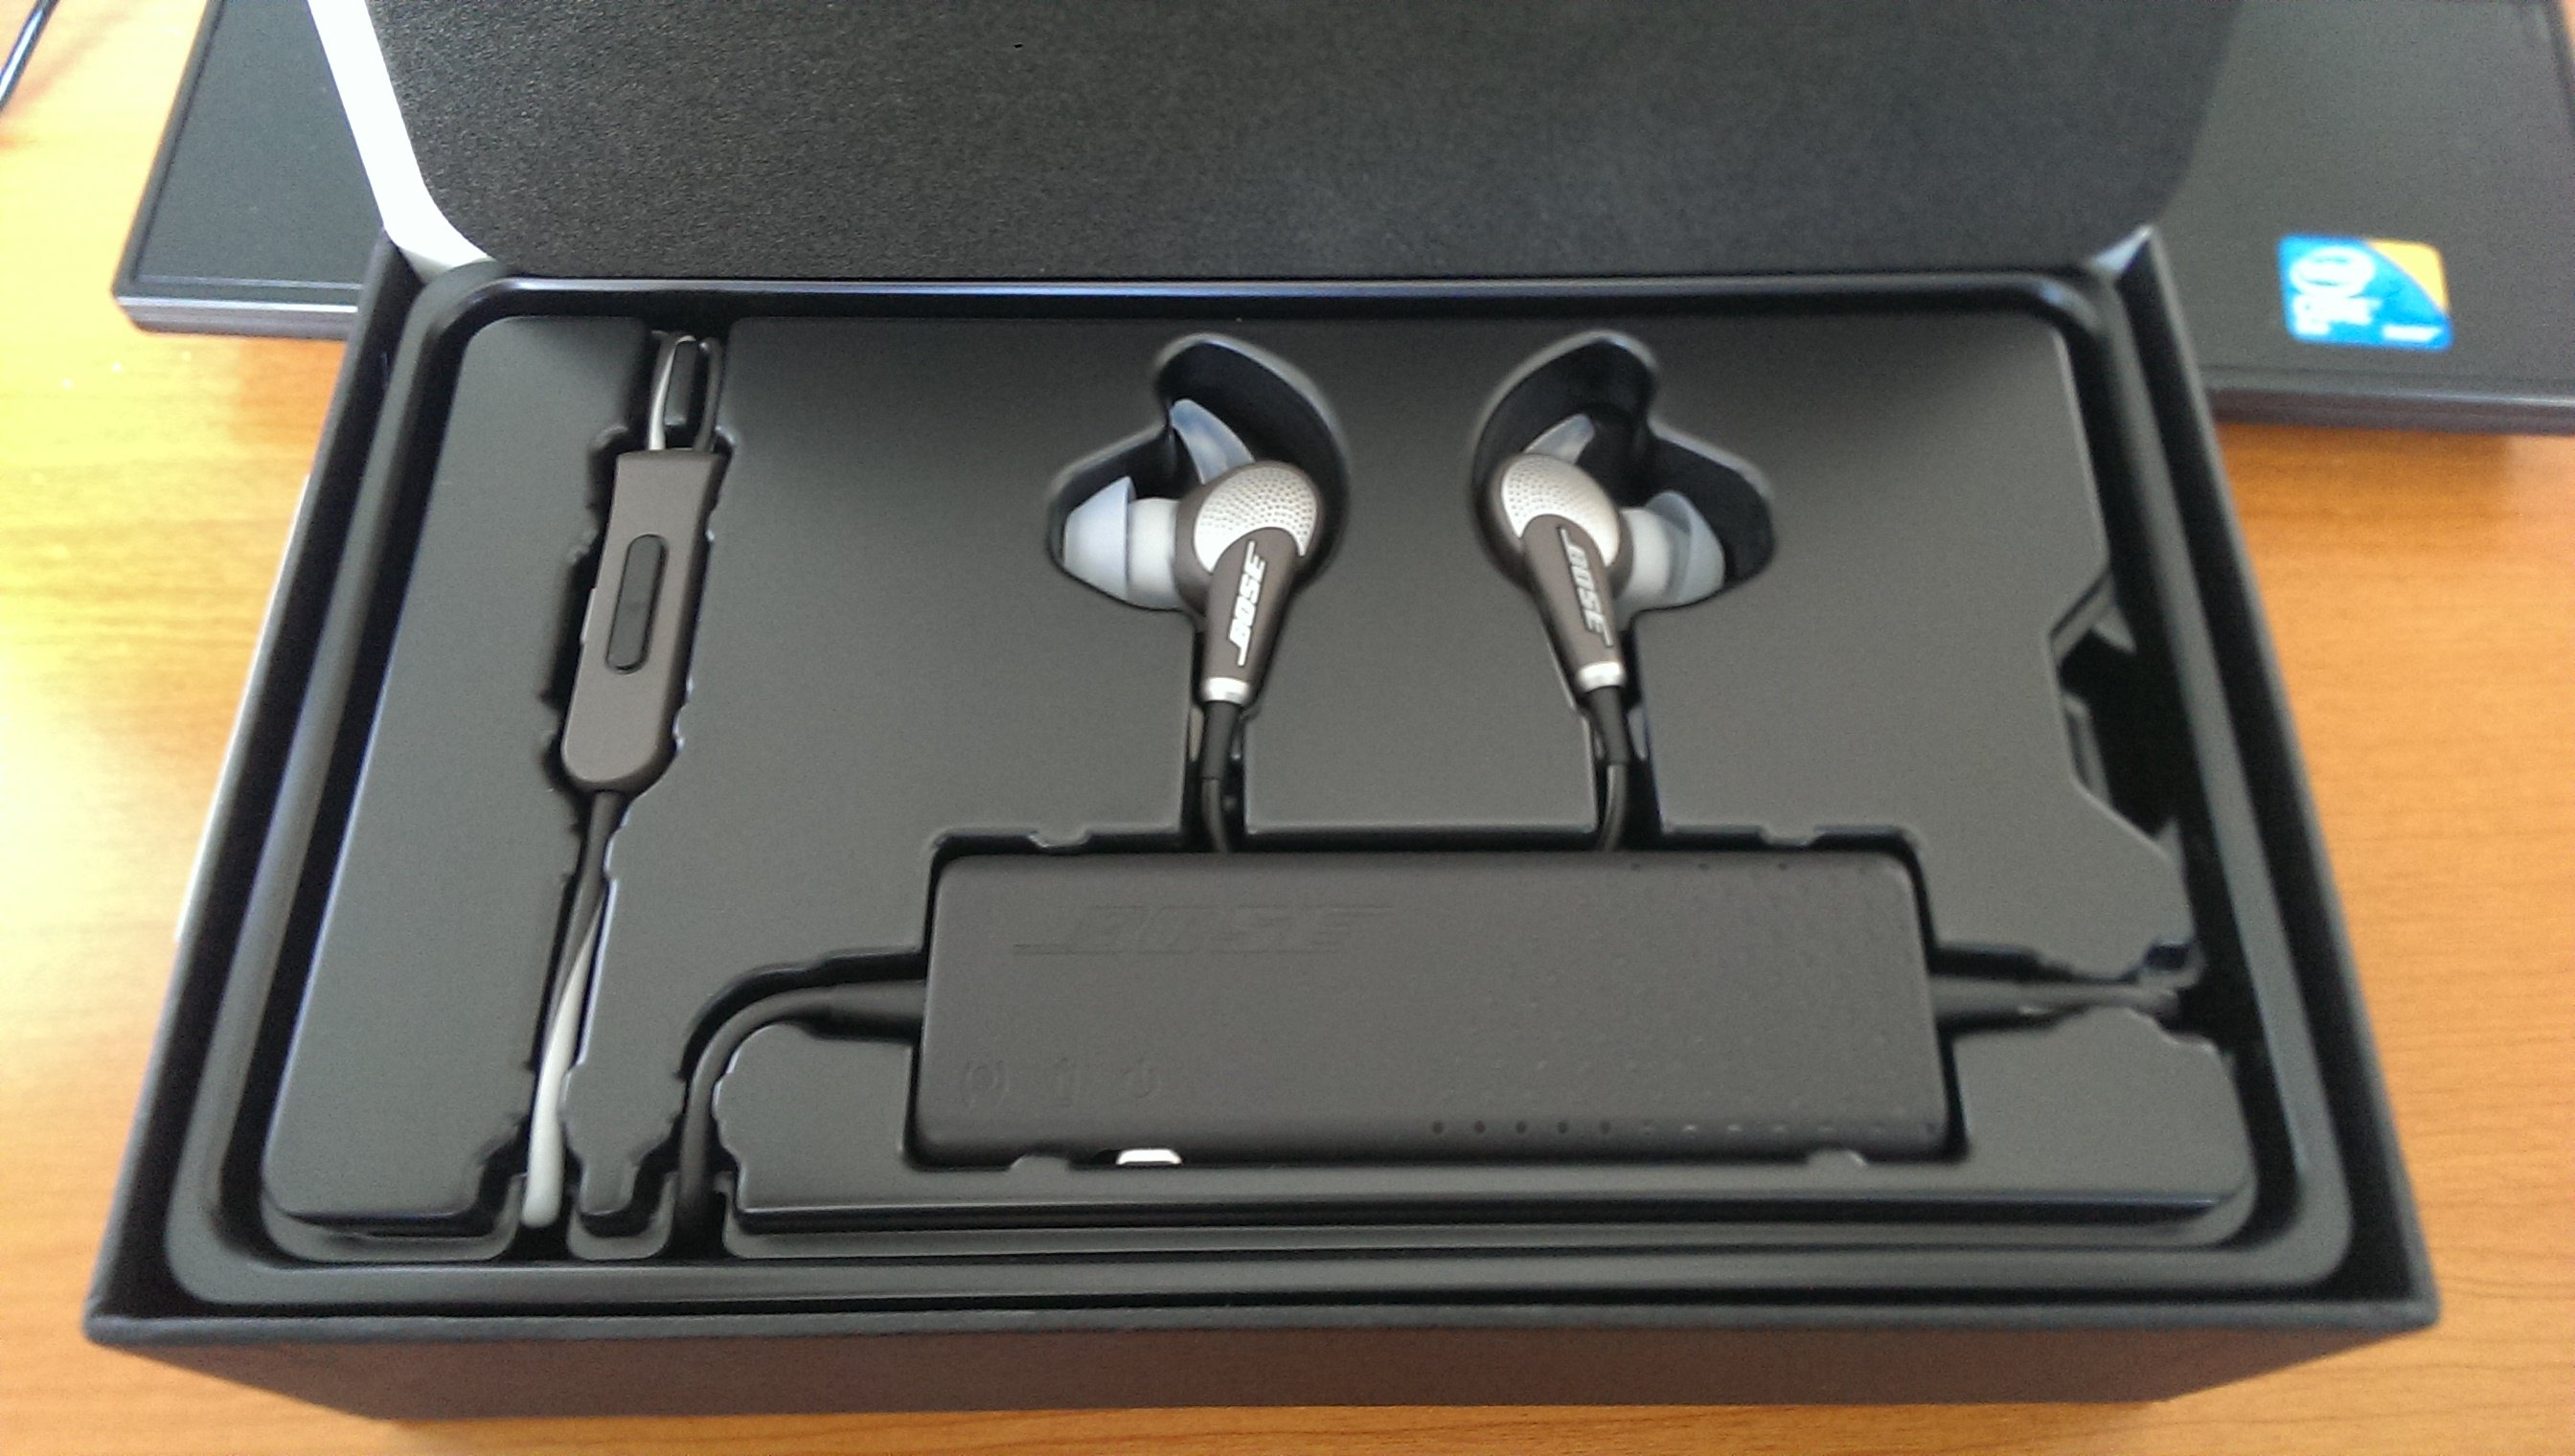 6dad7263180 Bose QuietComfort 20 Acoustic Noise Cancelling Headphones Review